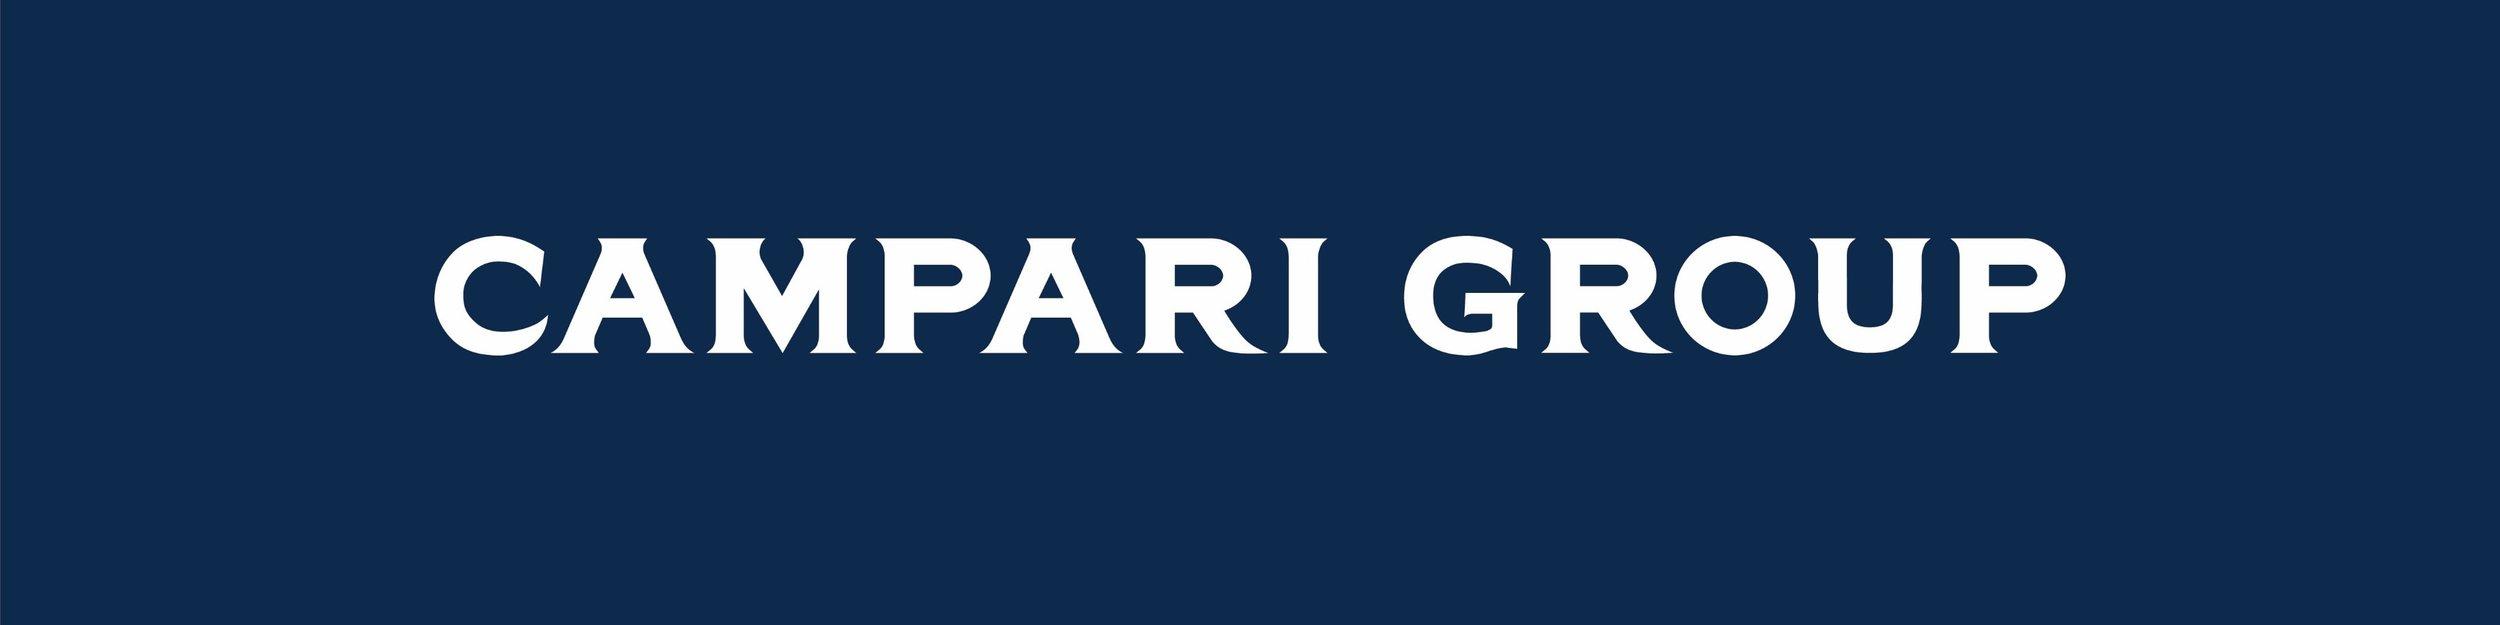 campari group logo